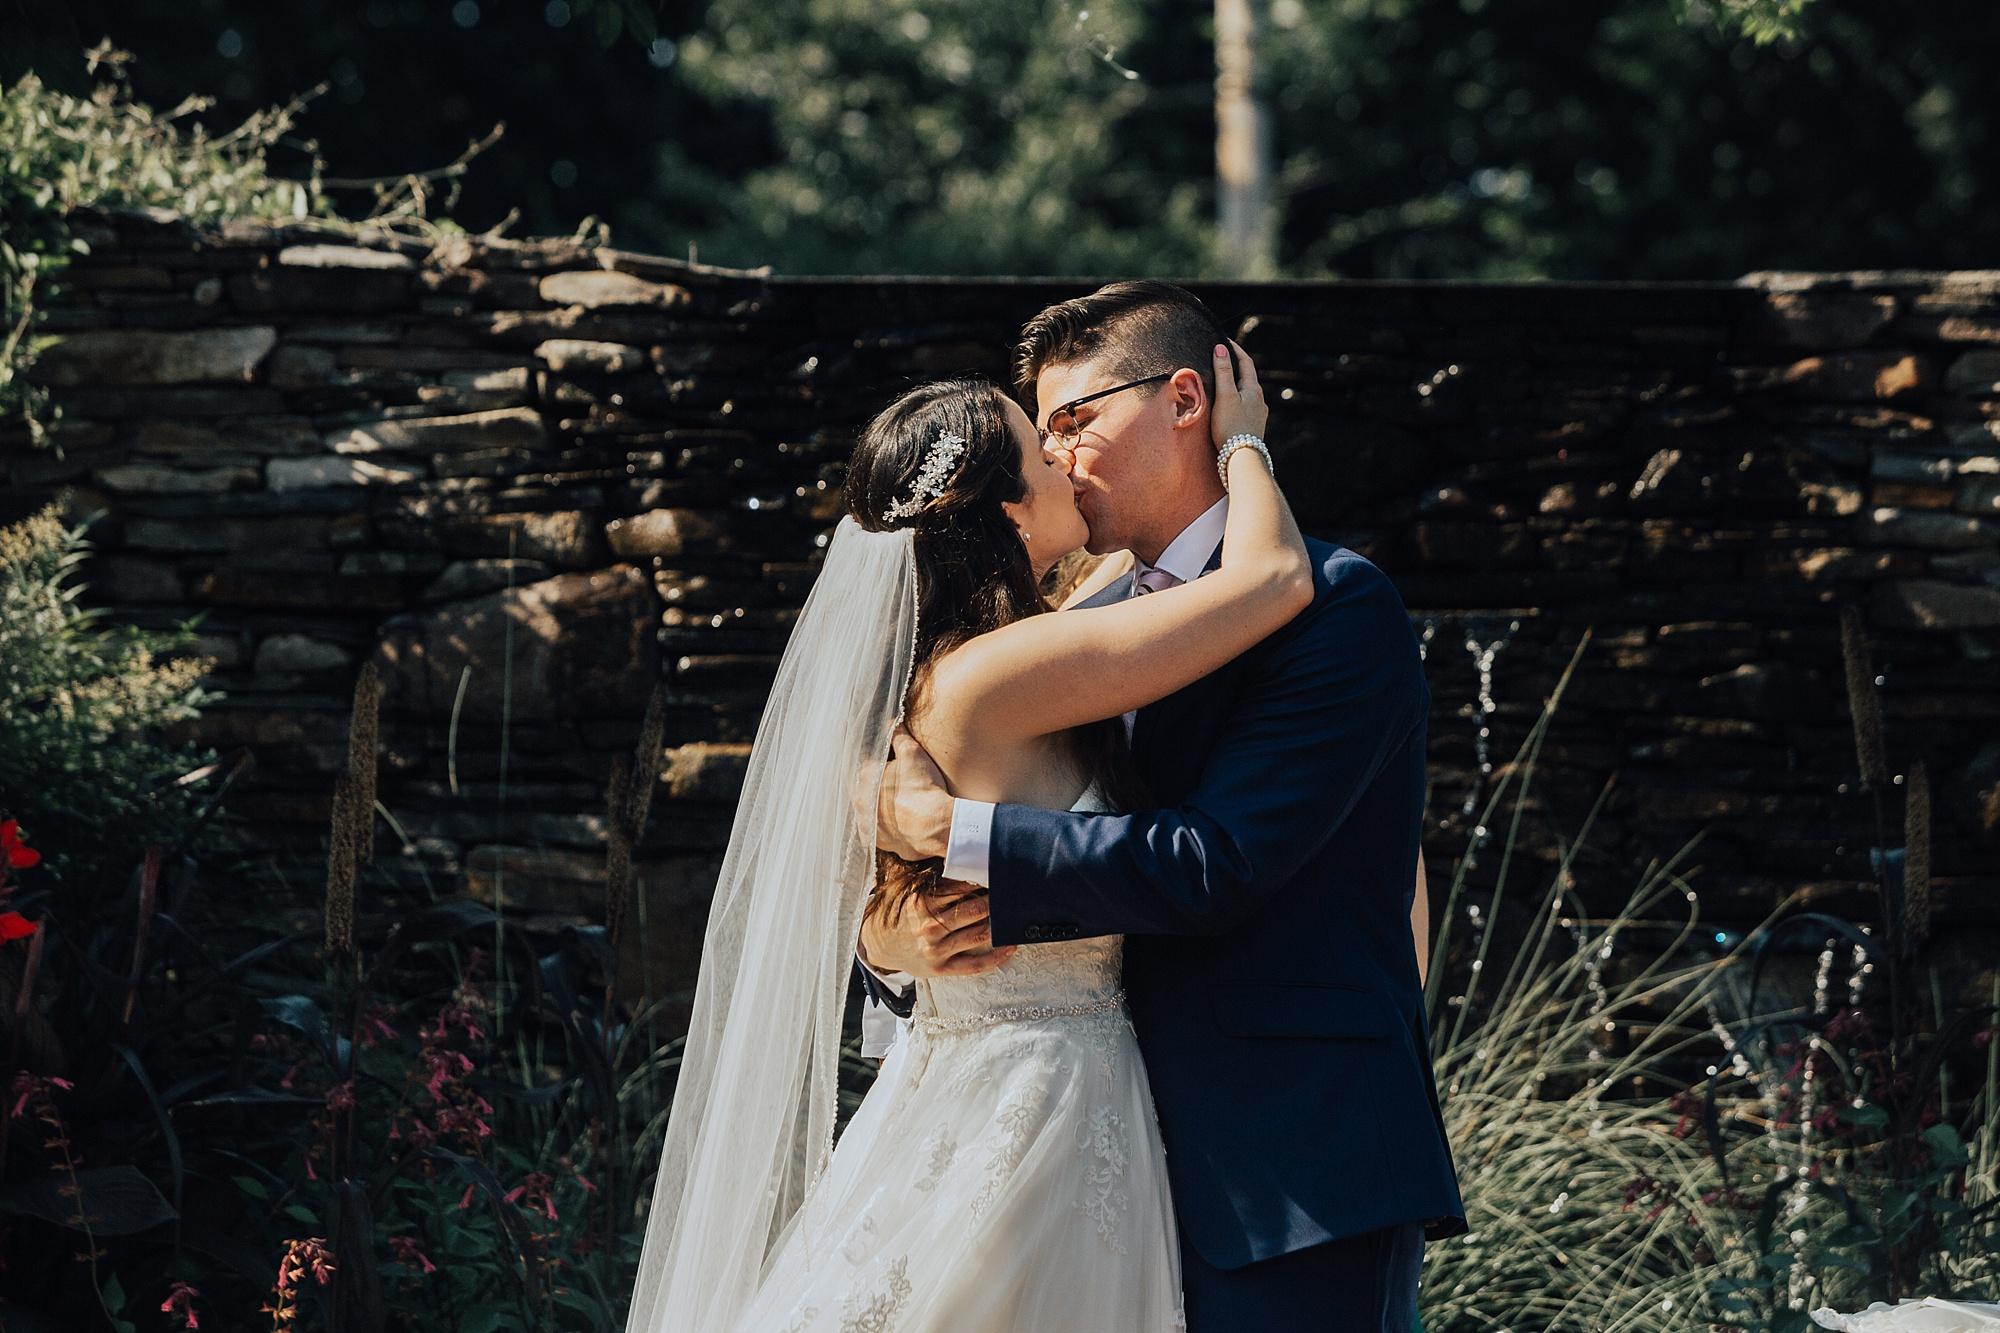 Love_by_Joe_Mac_Nicole_Patrick_Gables_At_Chadds_Ford_Wedding_Photography_Best_Philadelphia__0071.jpg